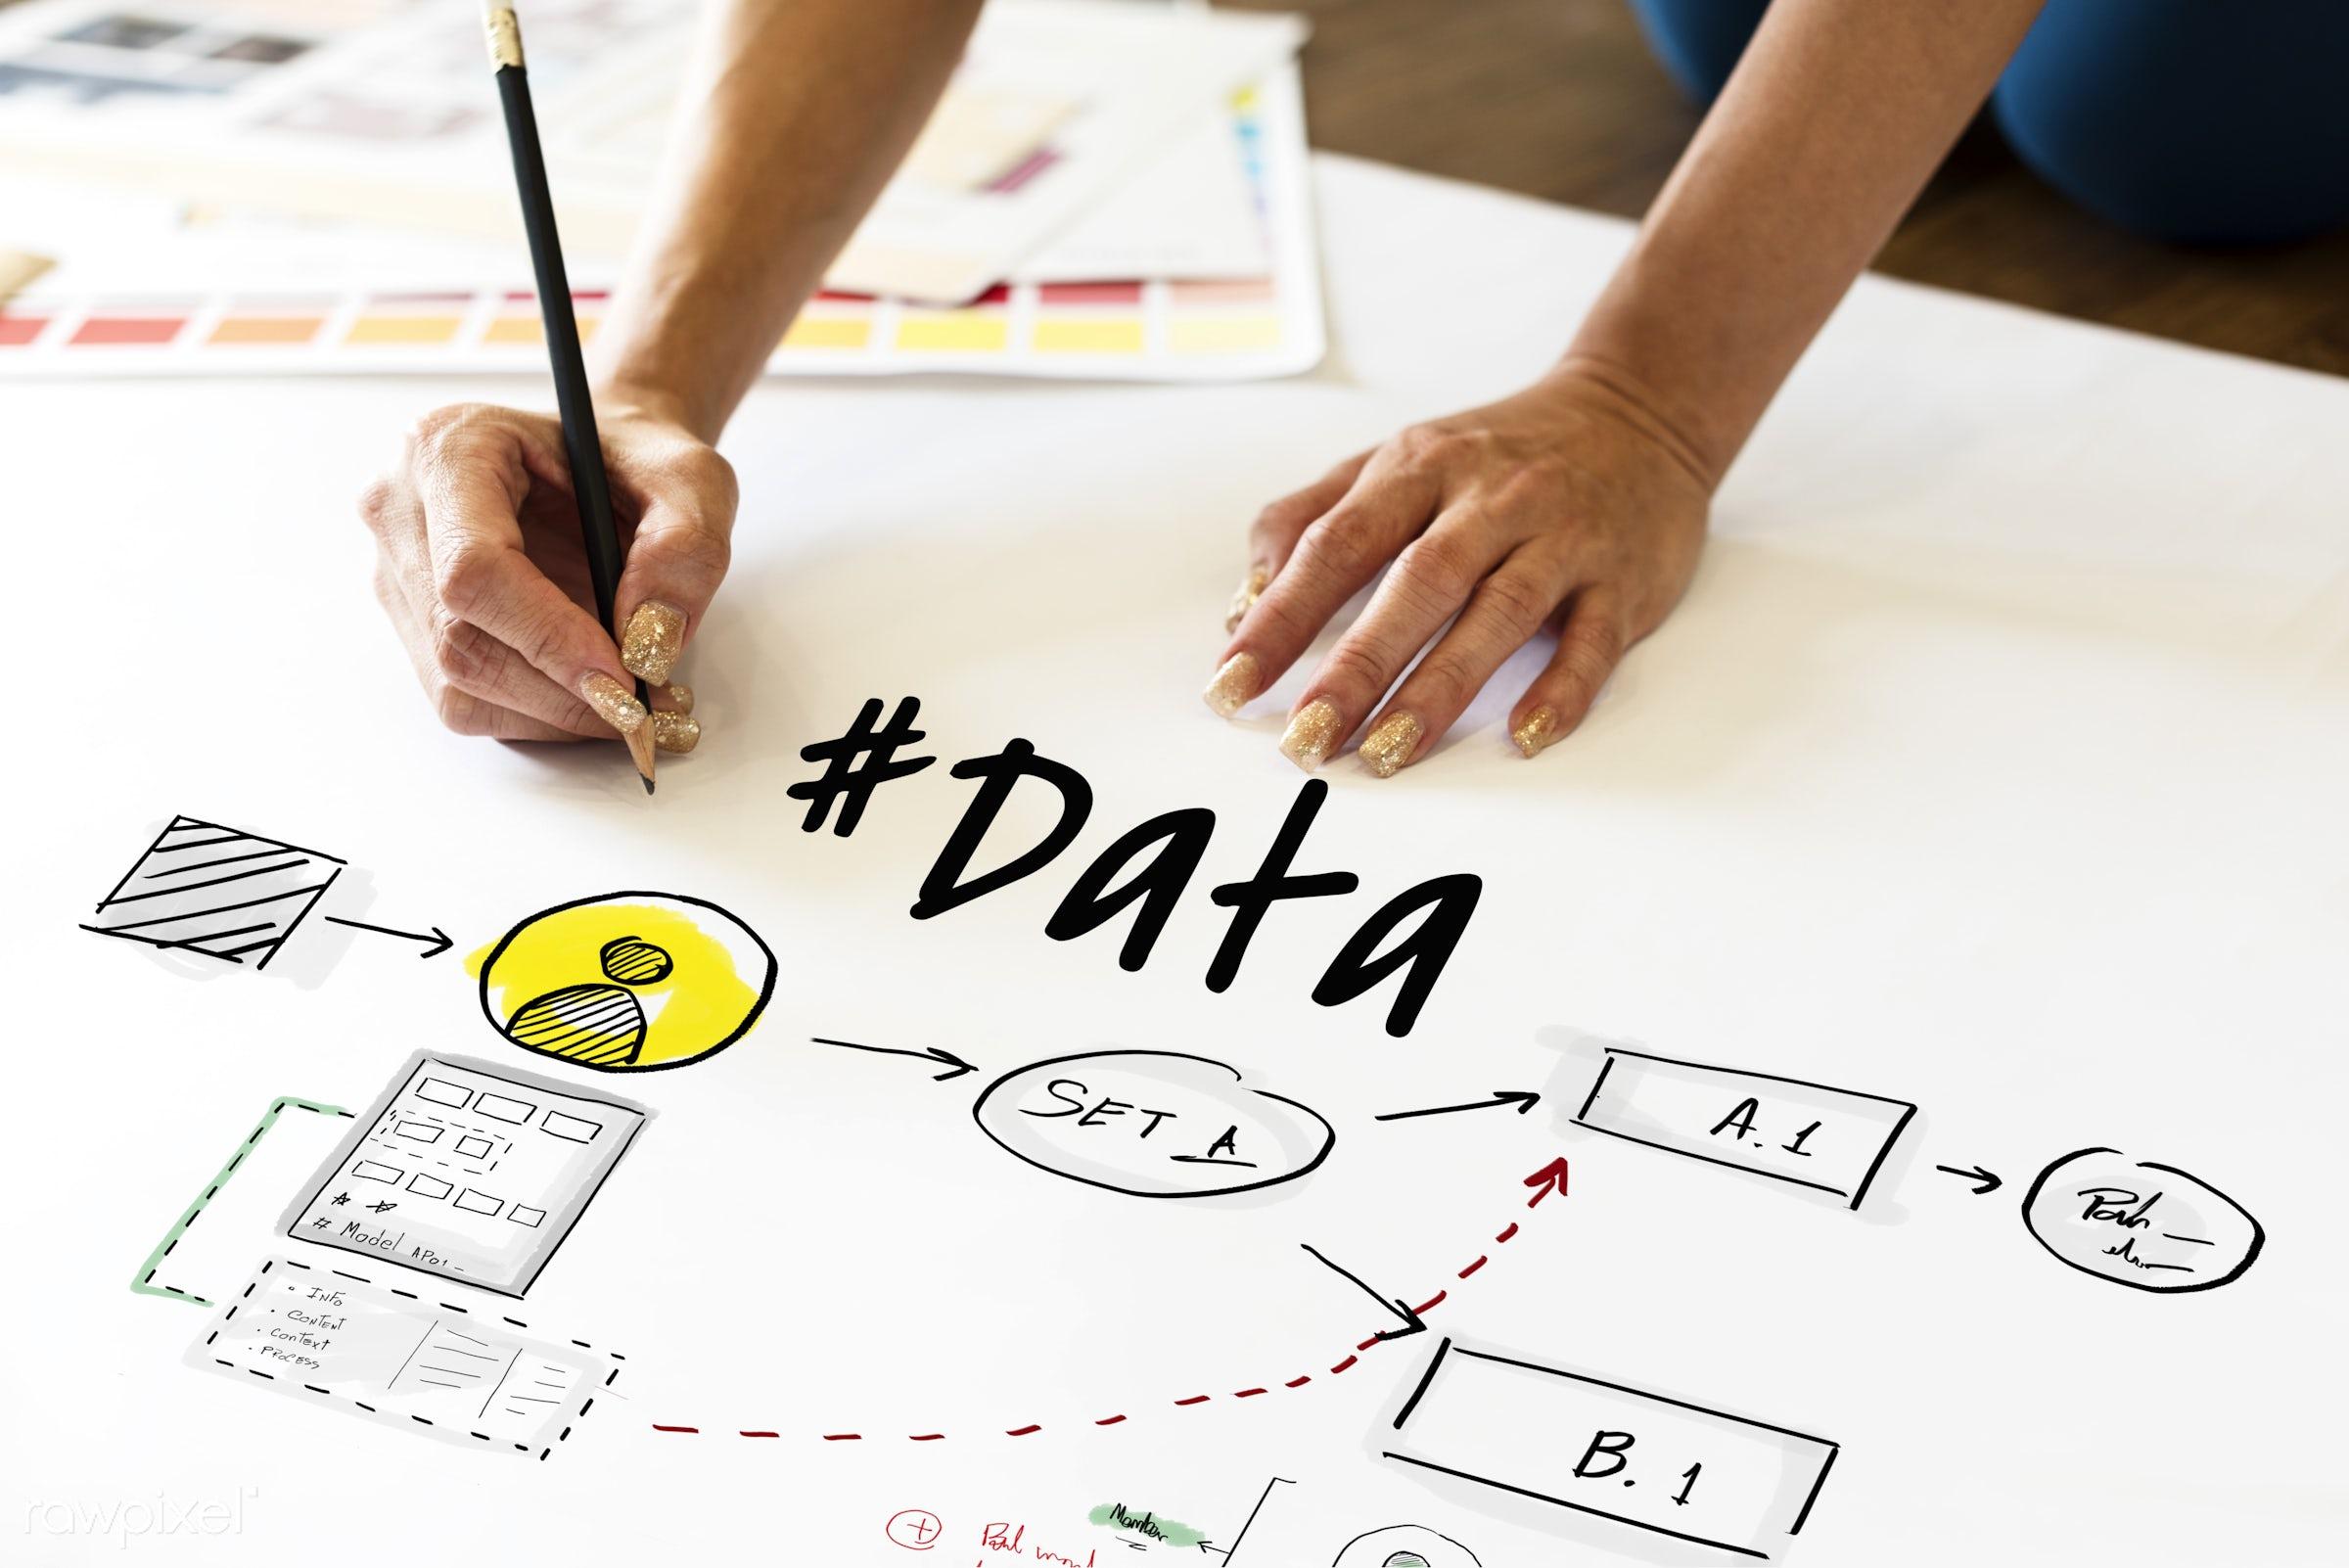 analysis, analytics, art, assessment, business, corporate, creation, creative, creativity, data, data base, data center,...